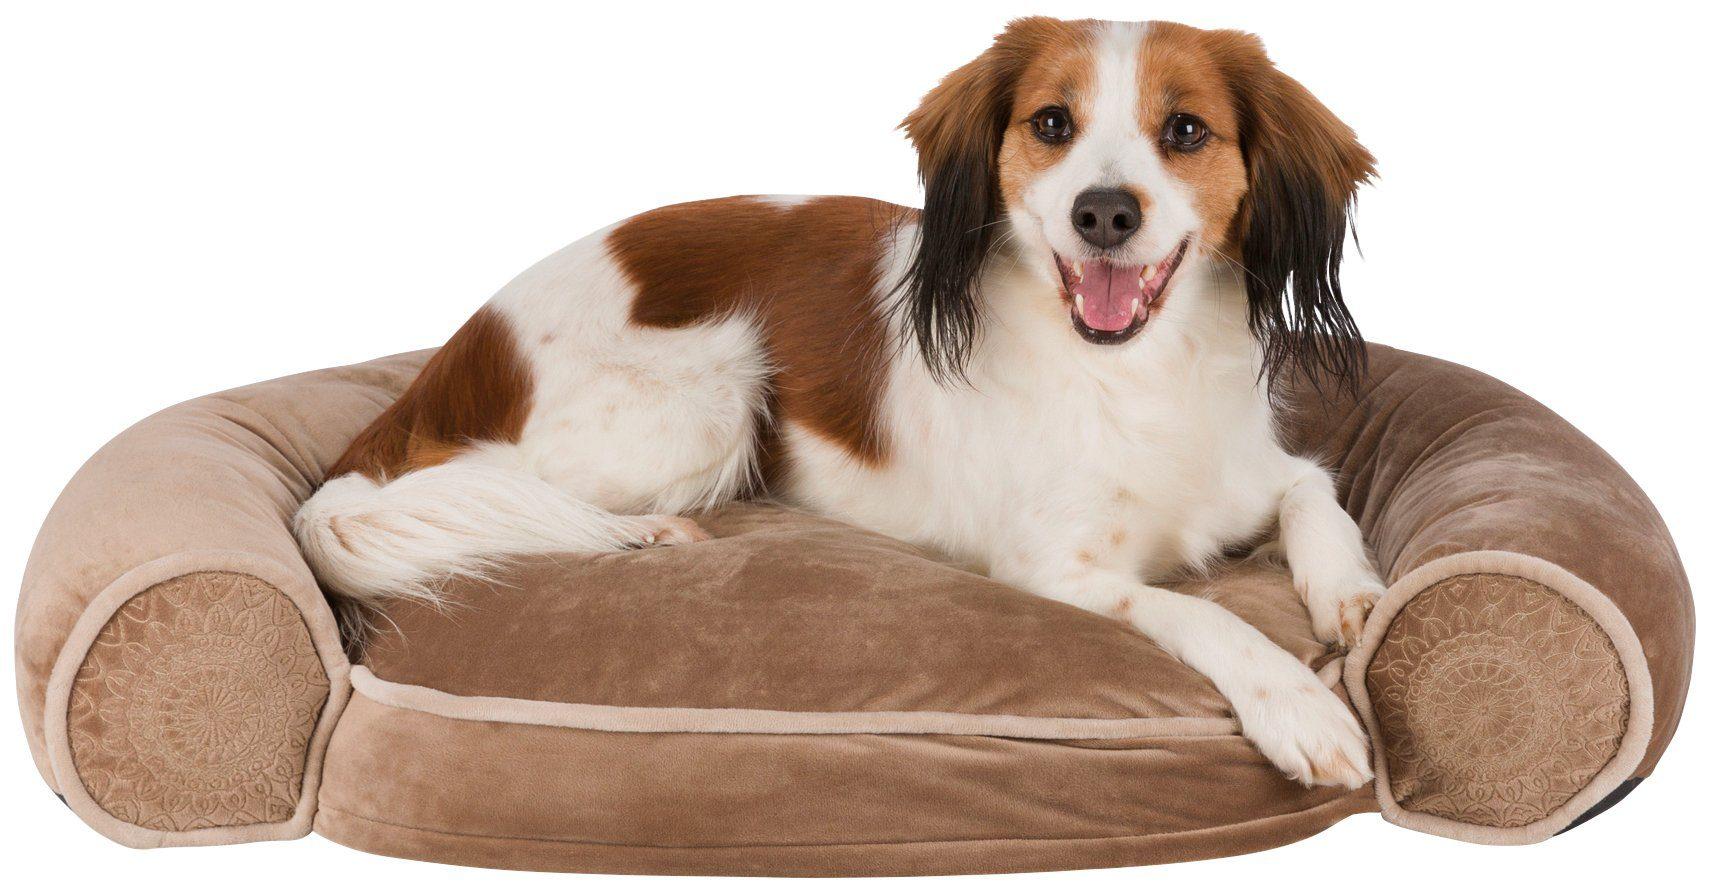 TRIXIE Hundesofa und Katzensofa »Mandala«, BxT: 80x60 cm, braun